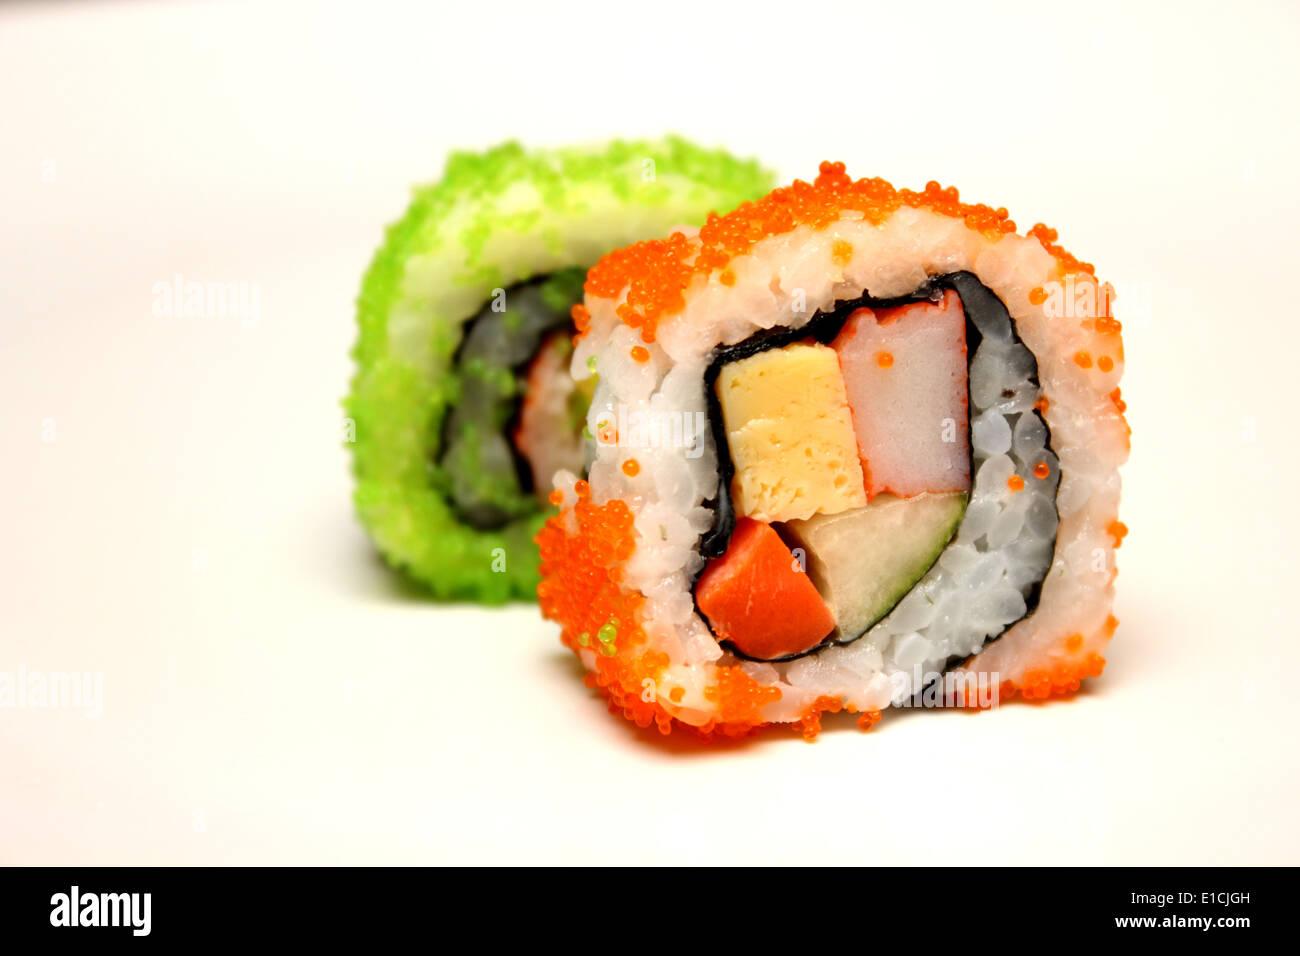 Closeup detail of nigiri sushi and california rolls. - Stock Image